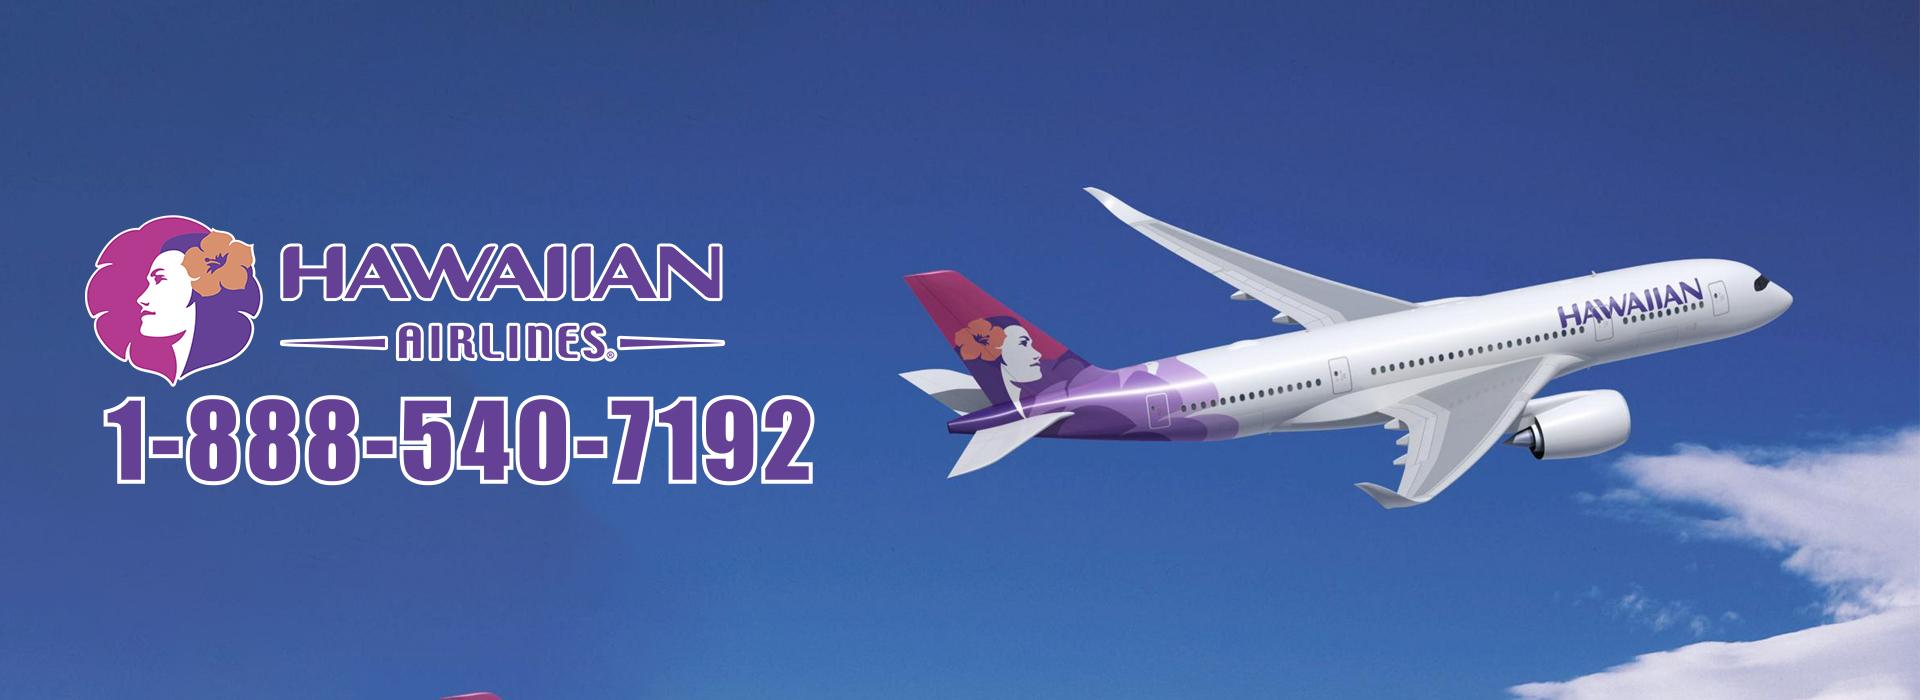 hawaiian airline phone number 1-888-540-7192